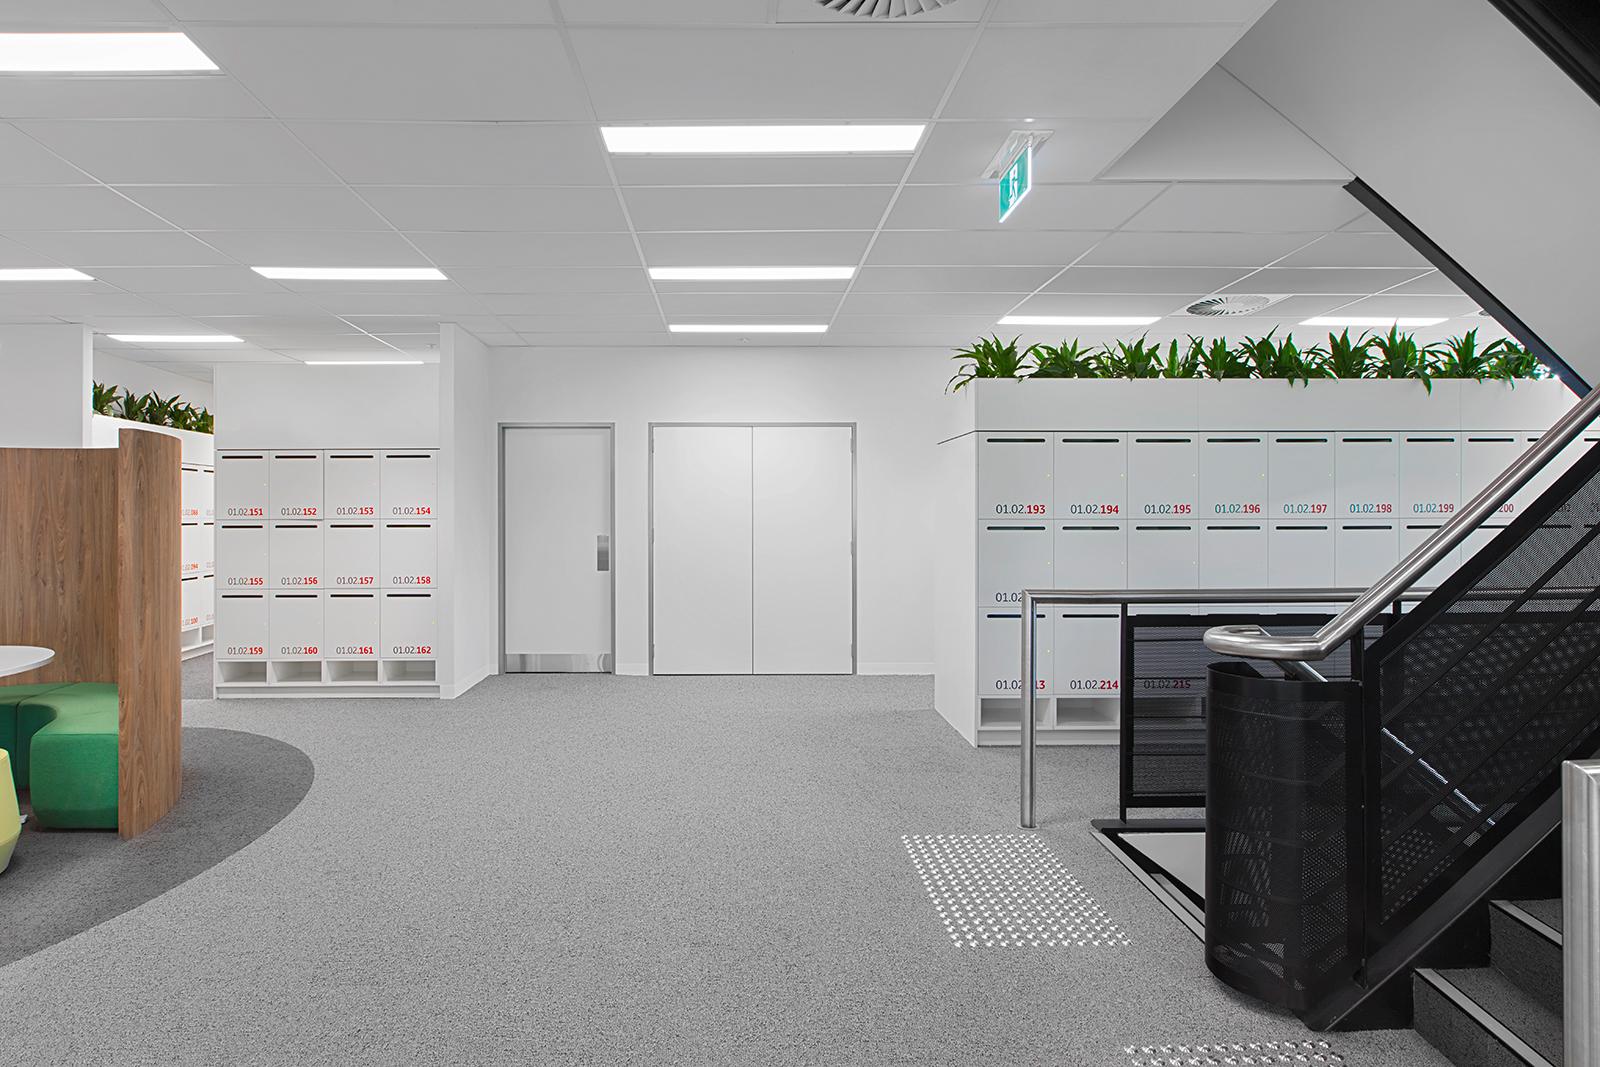 Planter box lockers at Toyota Australia